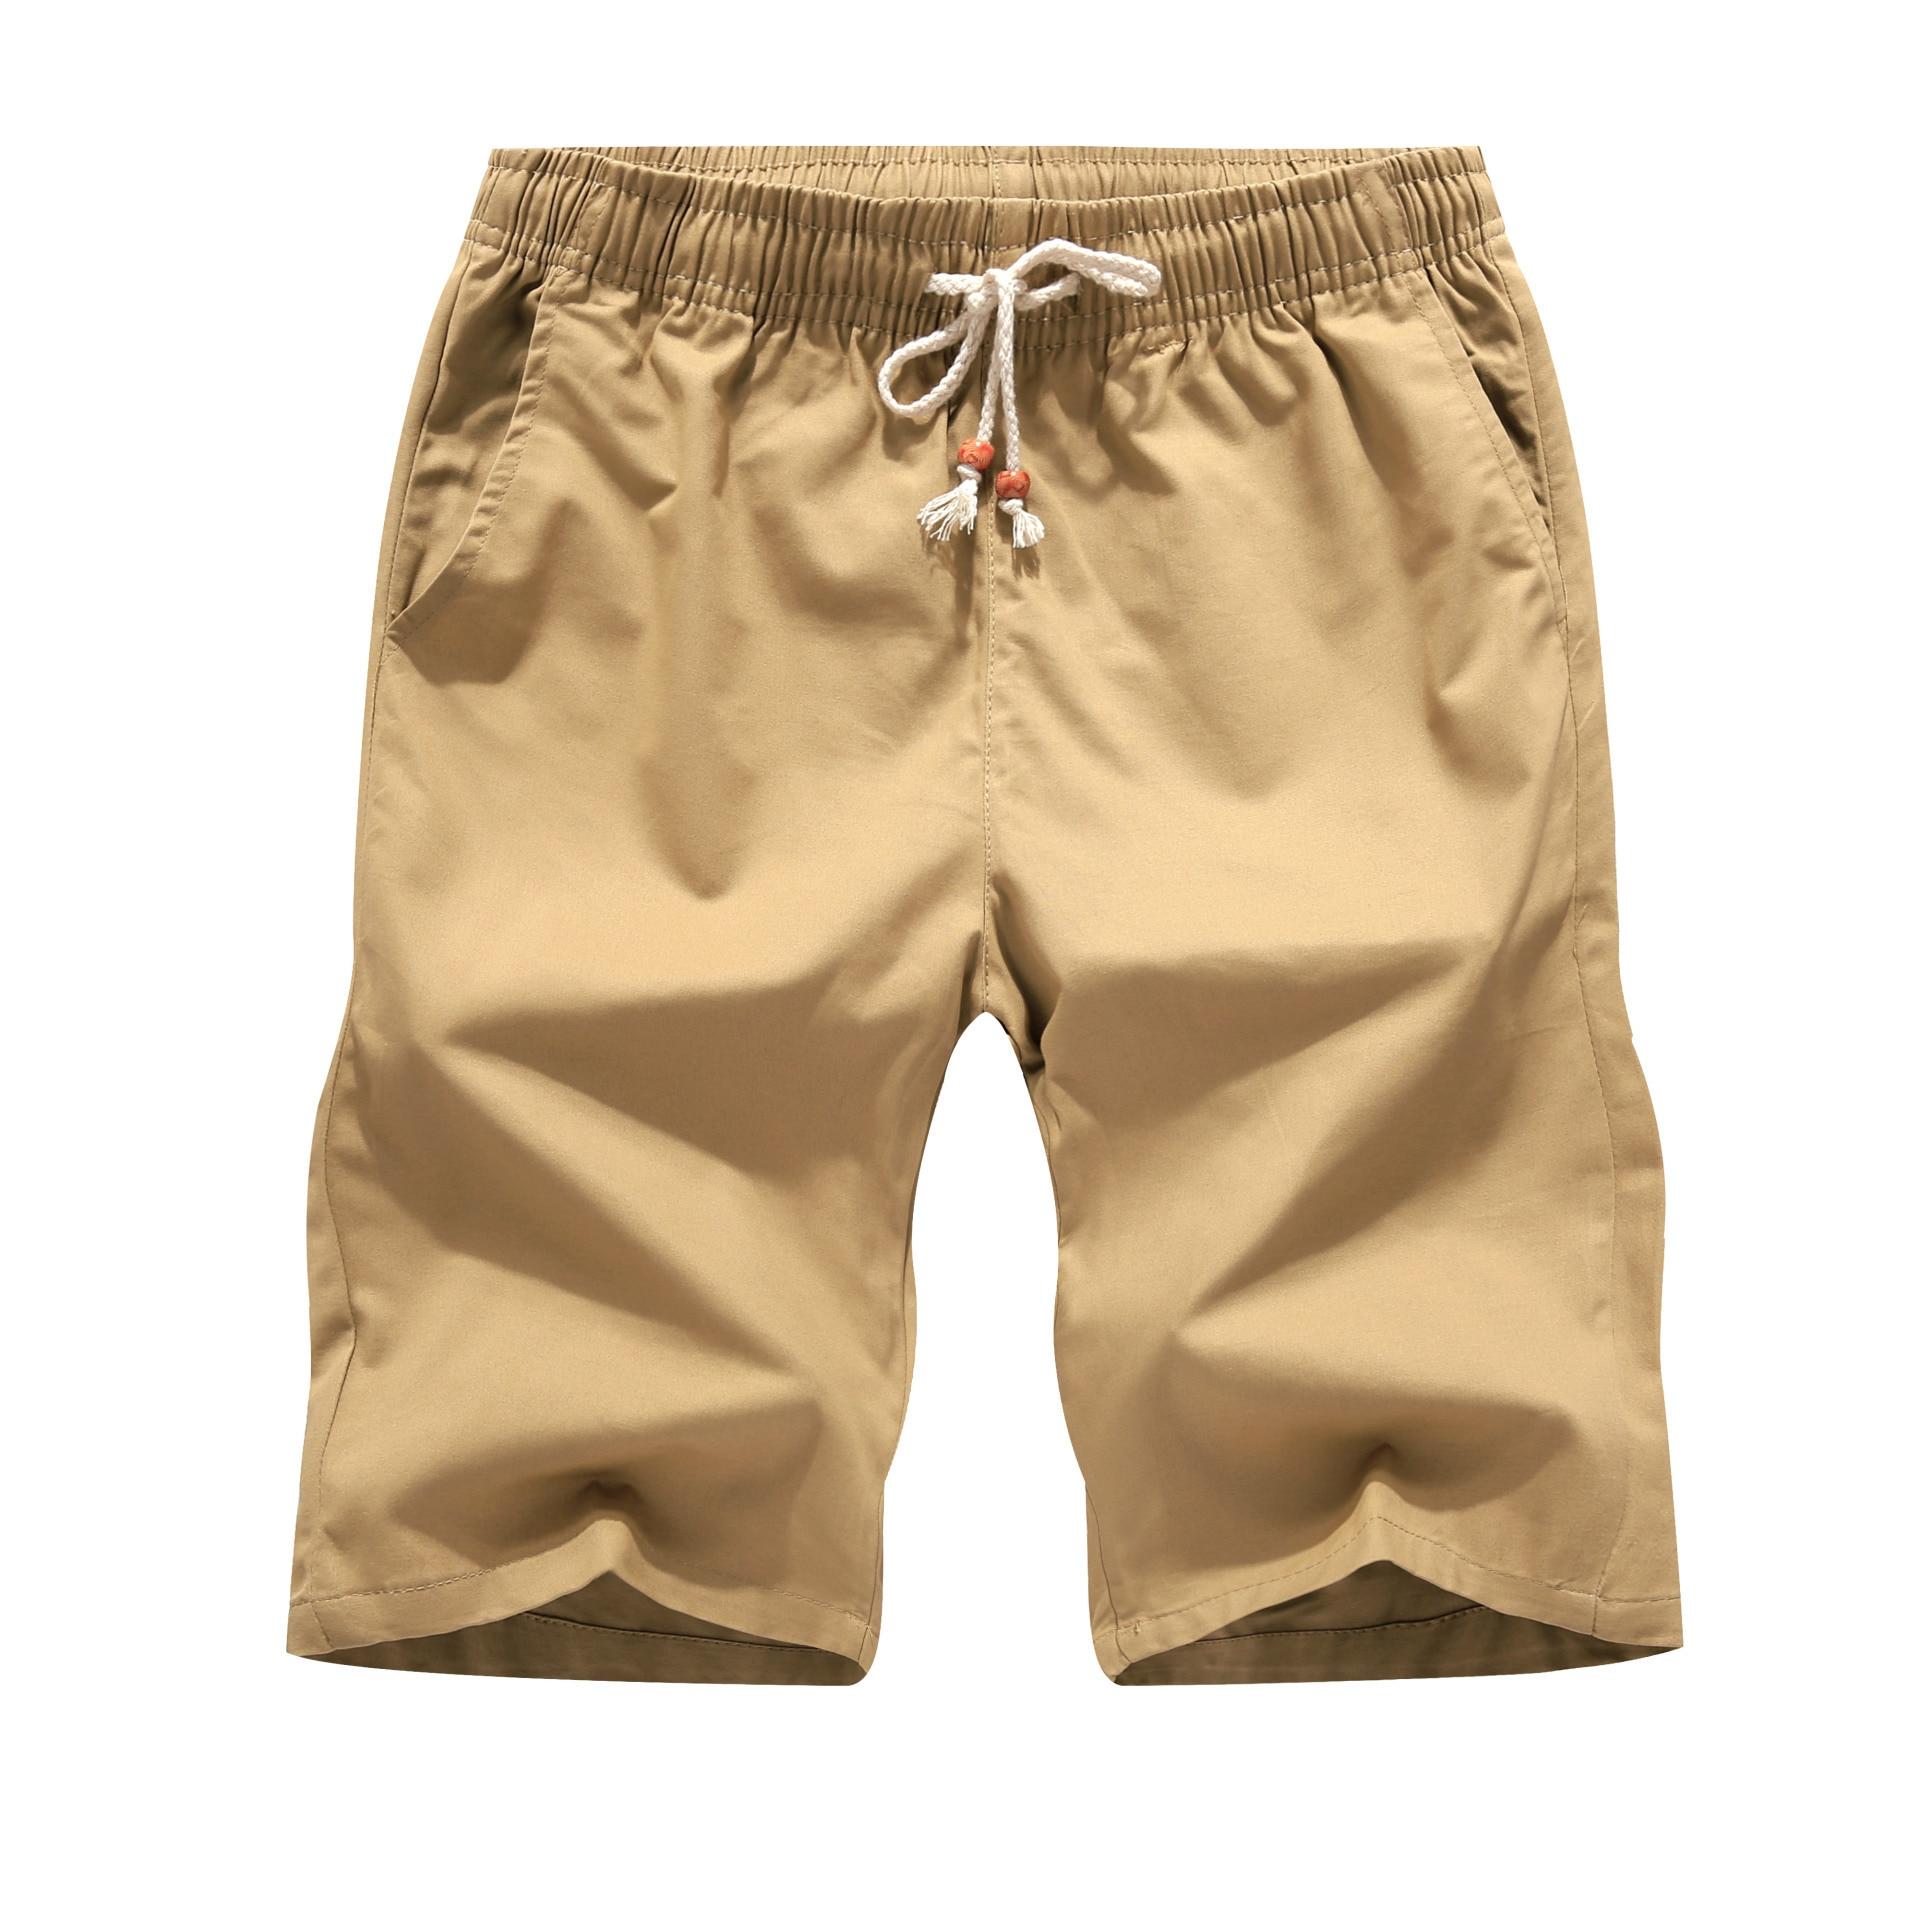 Cheap Khaki Shorts Reviews - Online Shopping Cheap Khaki Shorts ...